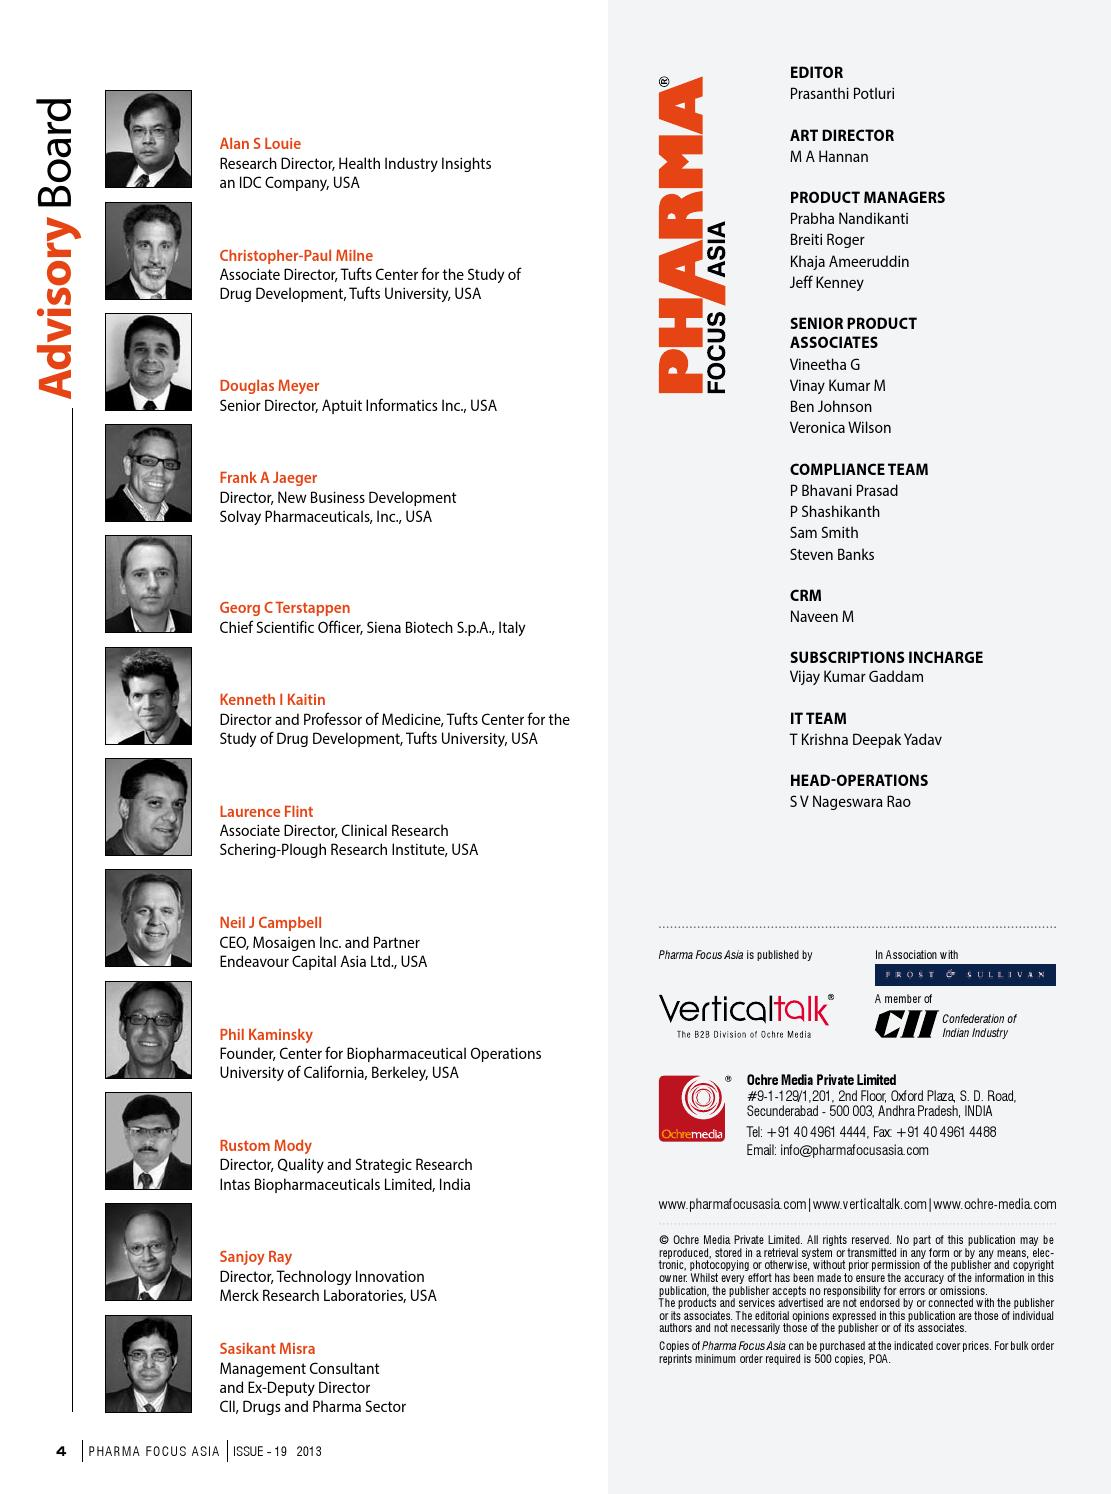 Pharma Focus Asia - Issue 19 by Ochre Media Pvt  Ltd  - issuu